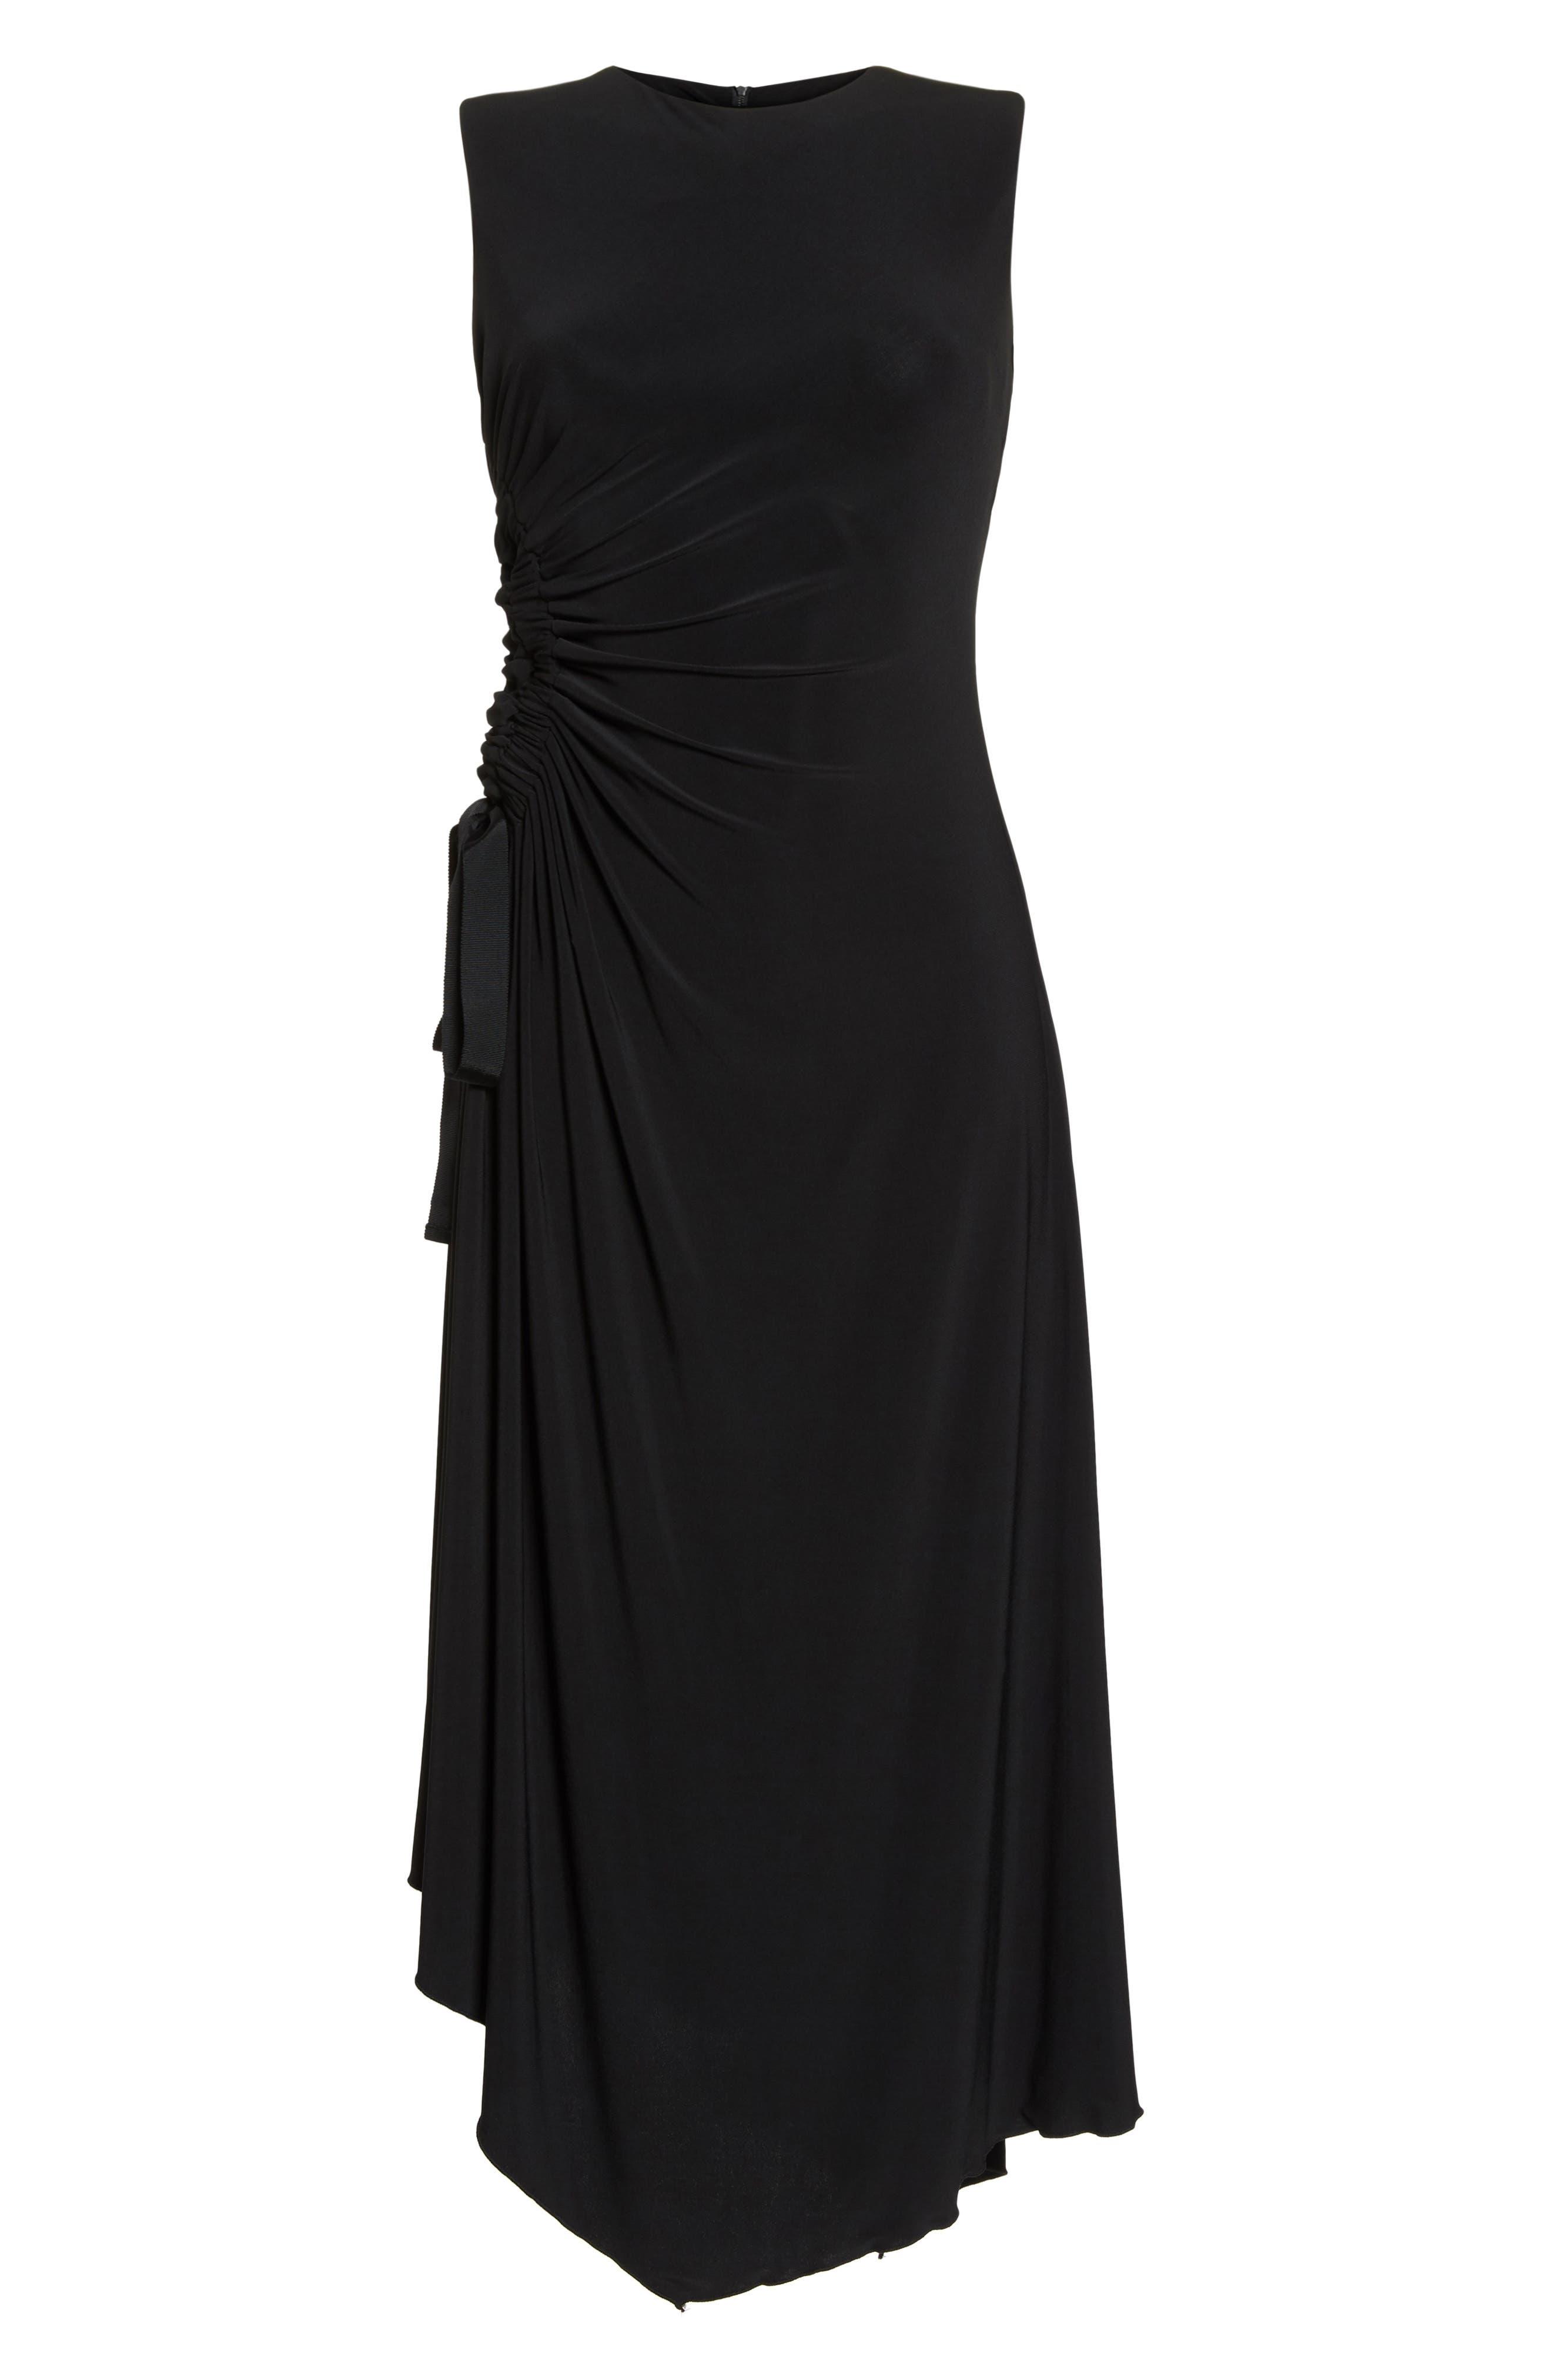 Ruched Side Tie Midi Dress,                             Alternate thumbnail 7, color,                             Black